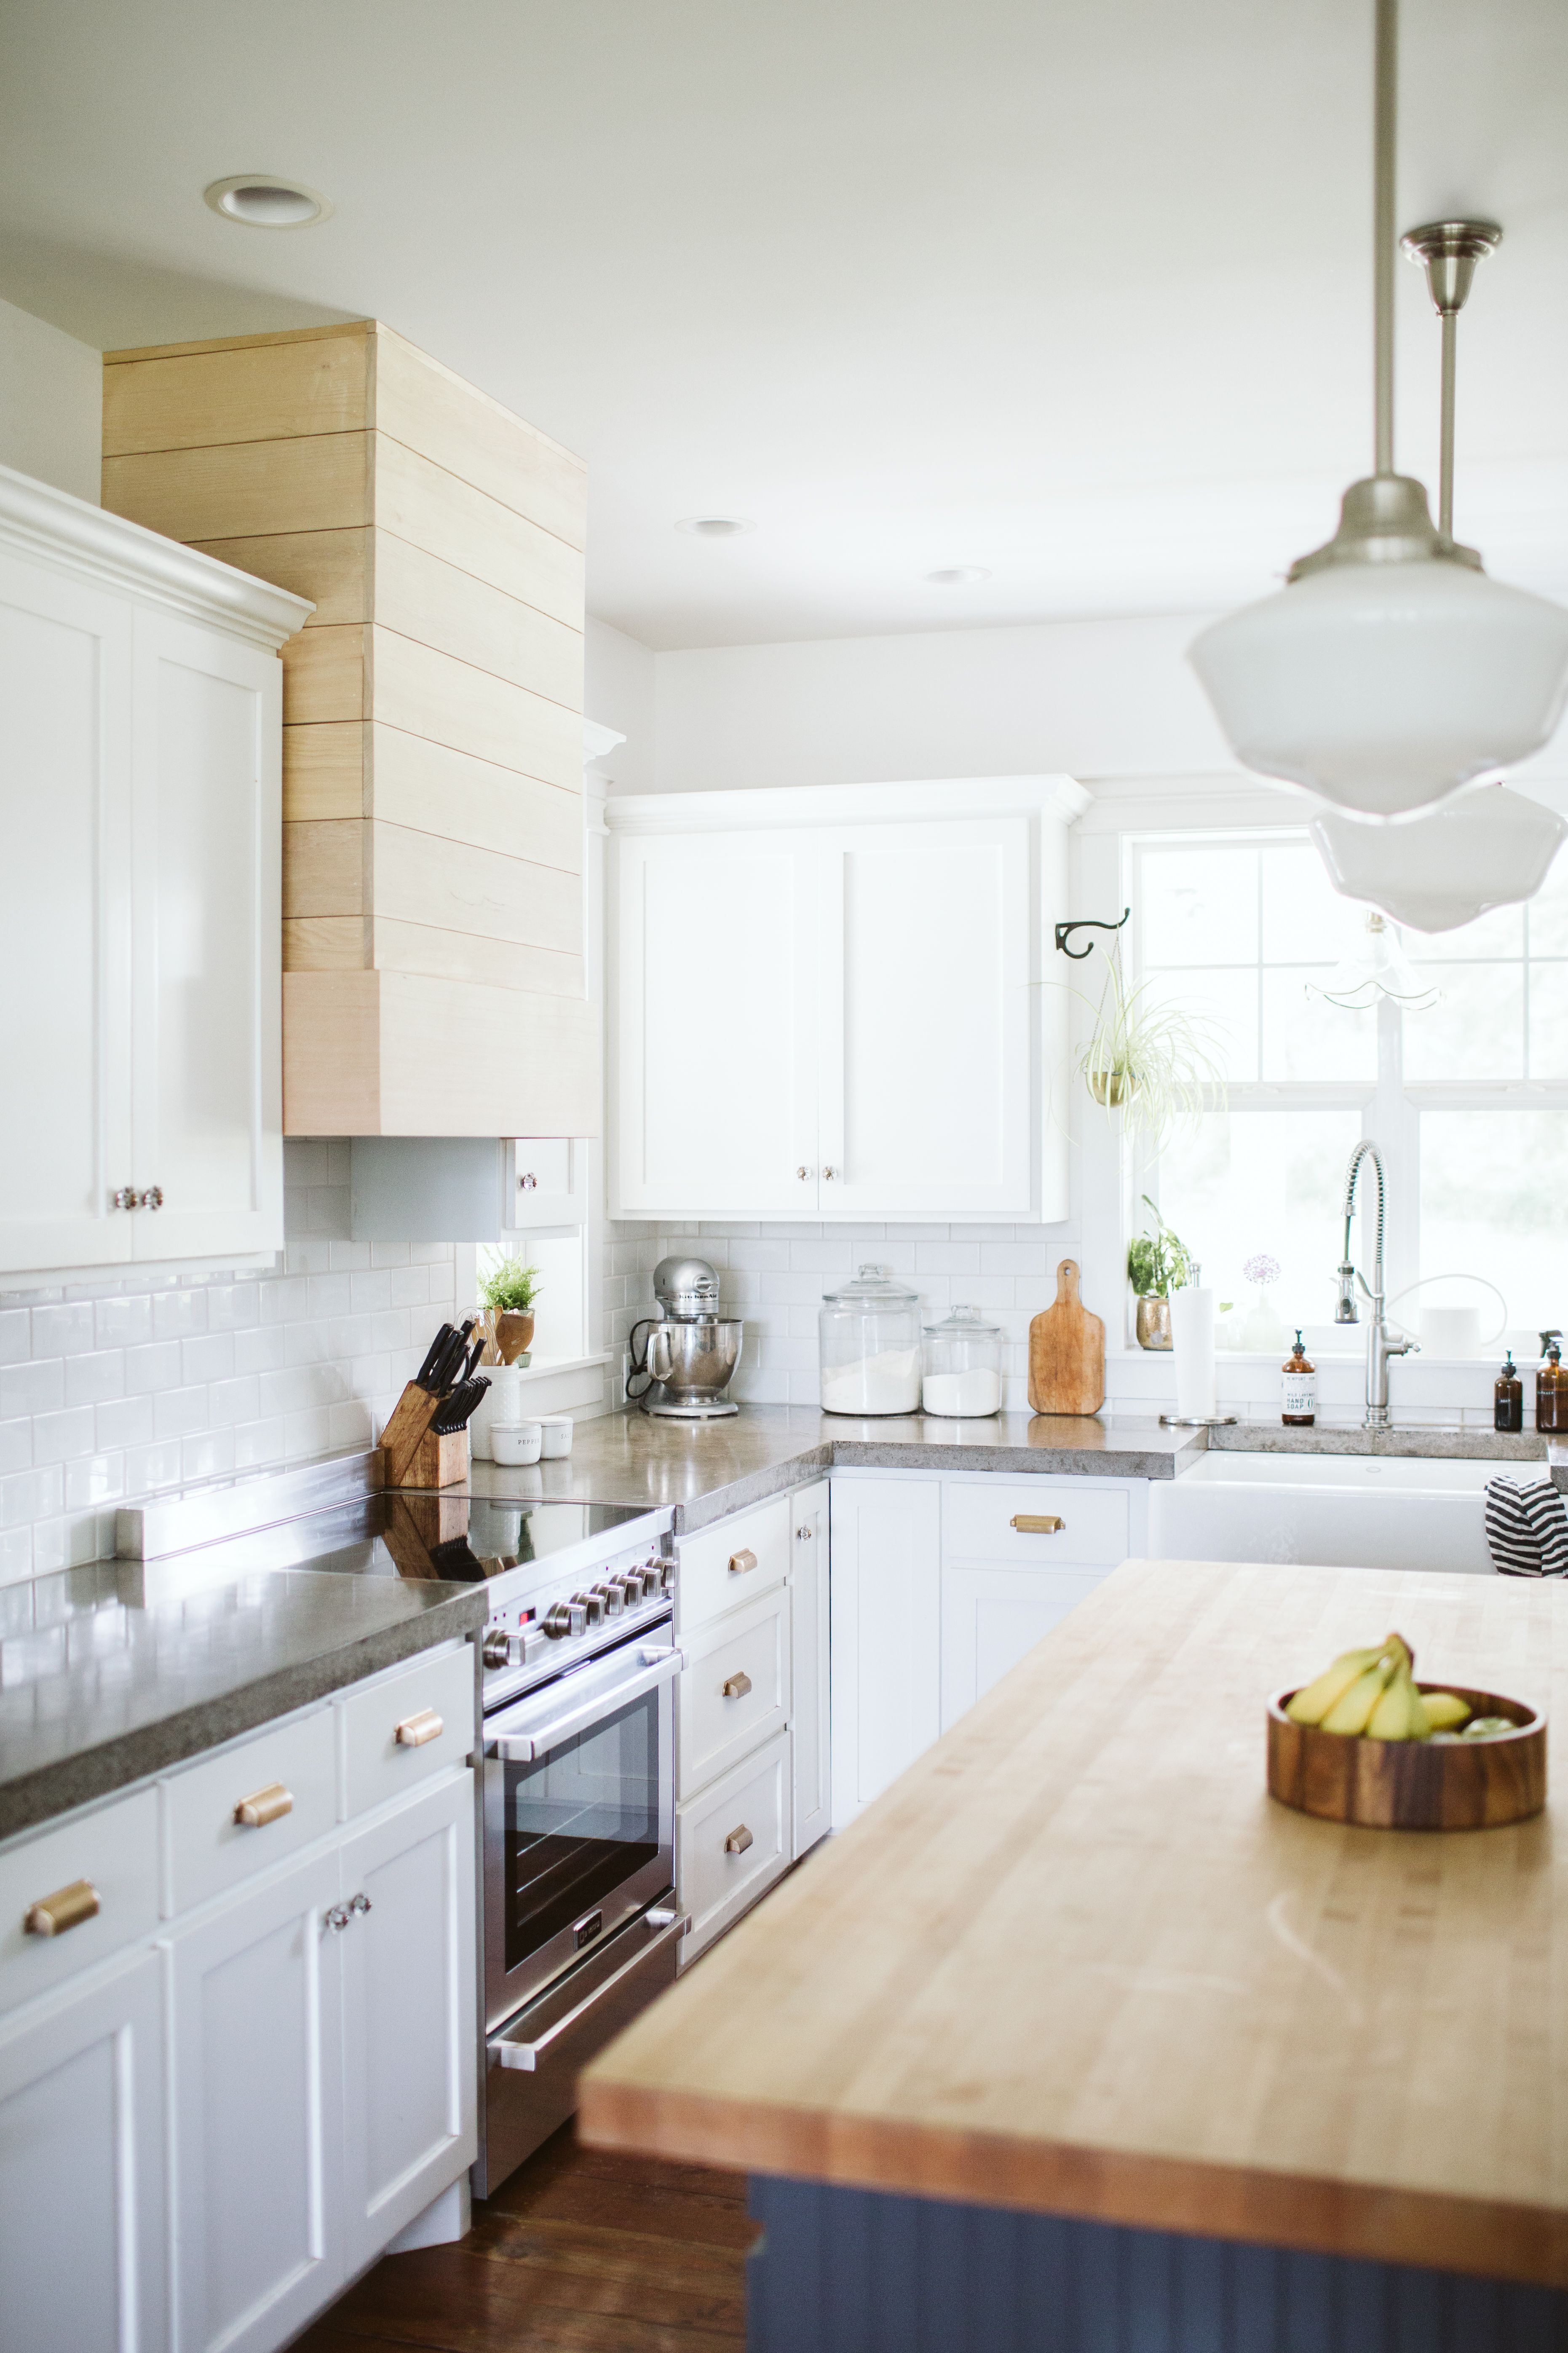 Bright white modern farmhouse kitchen featuring a Verona